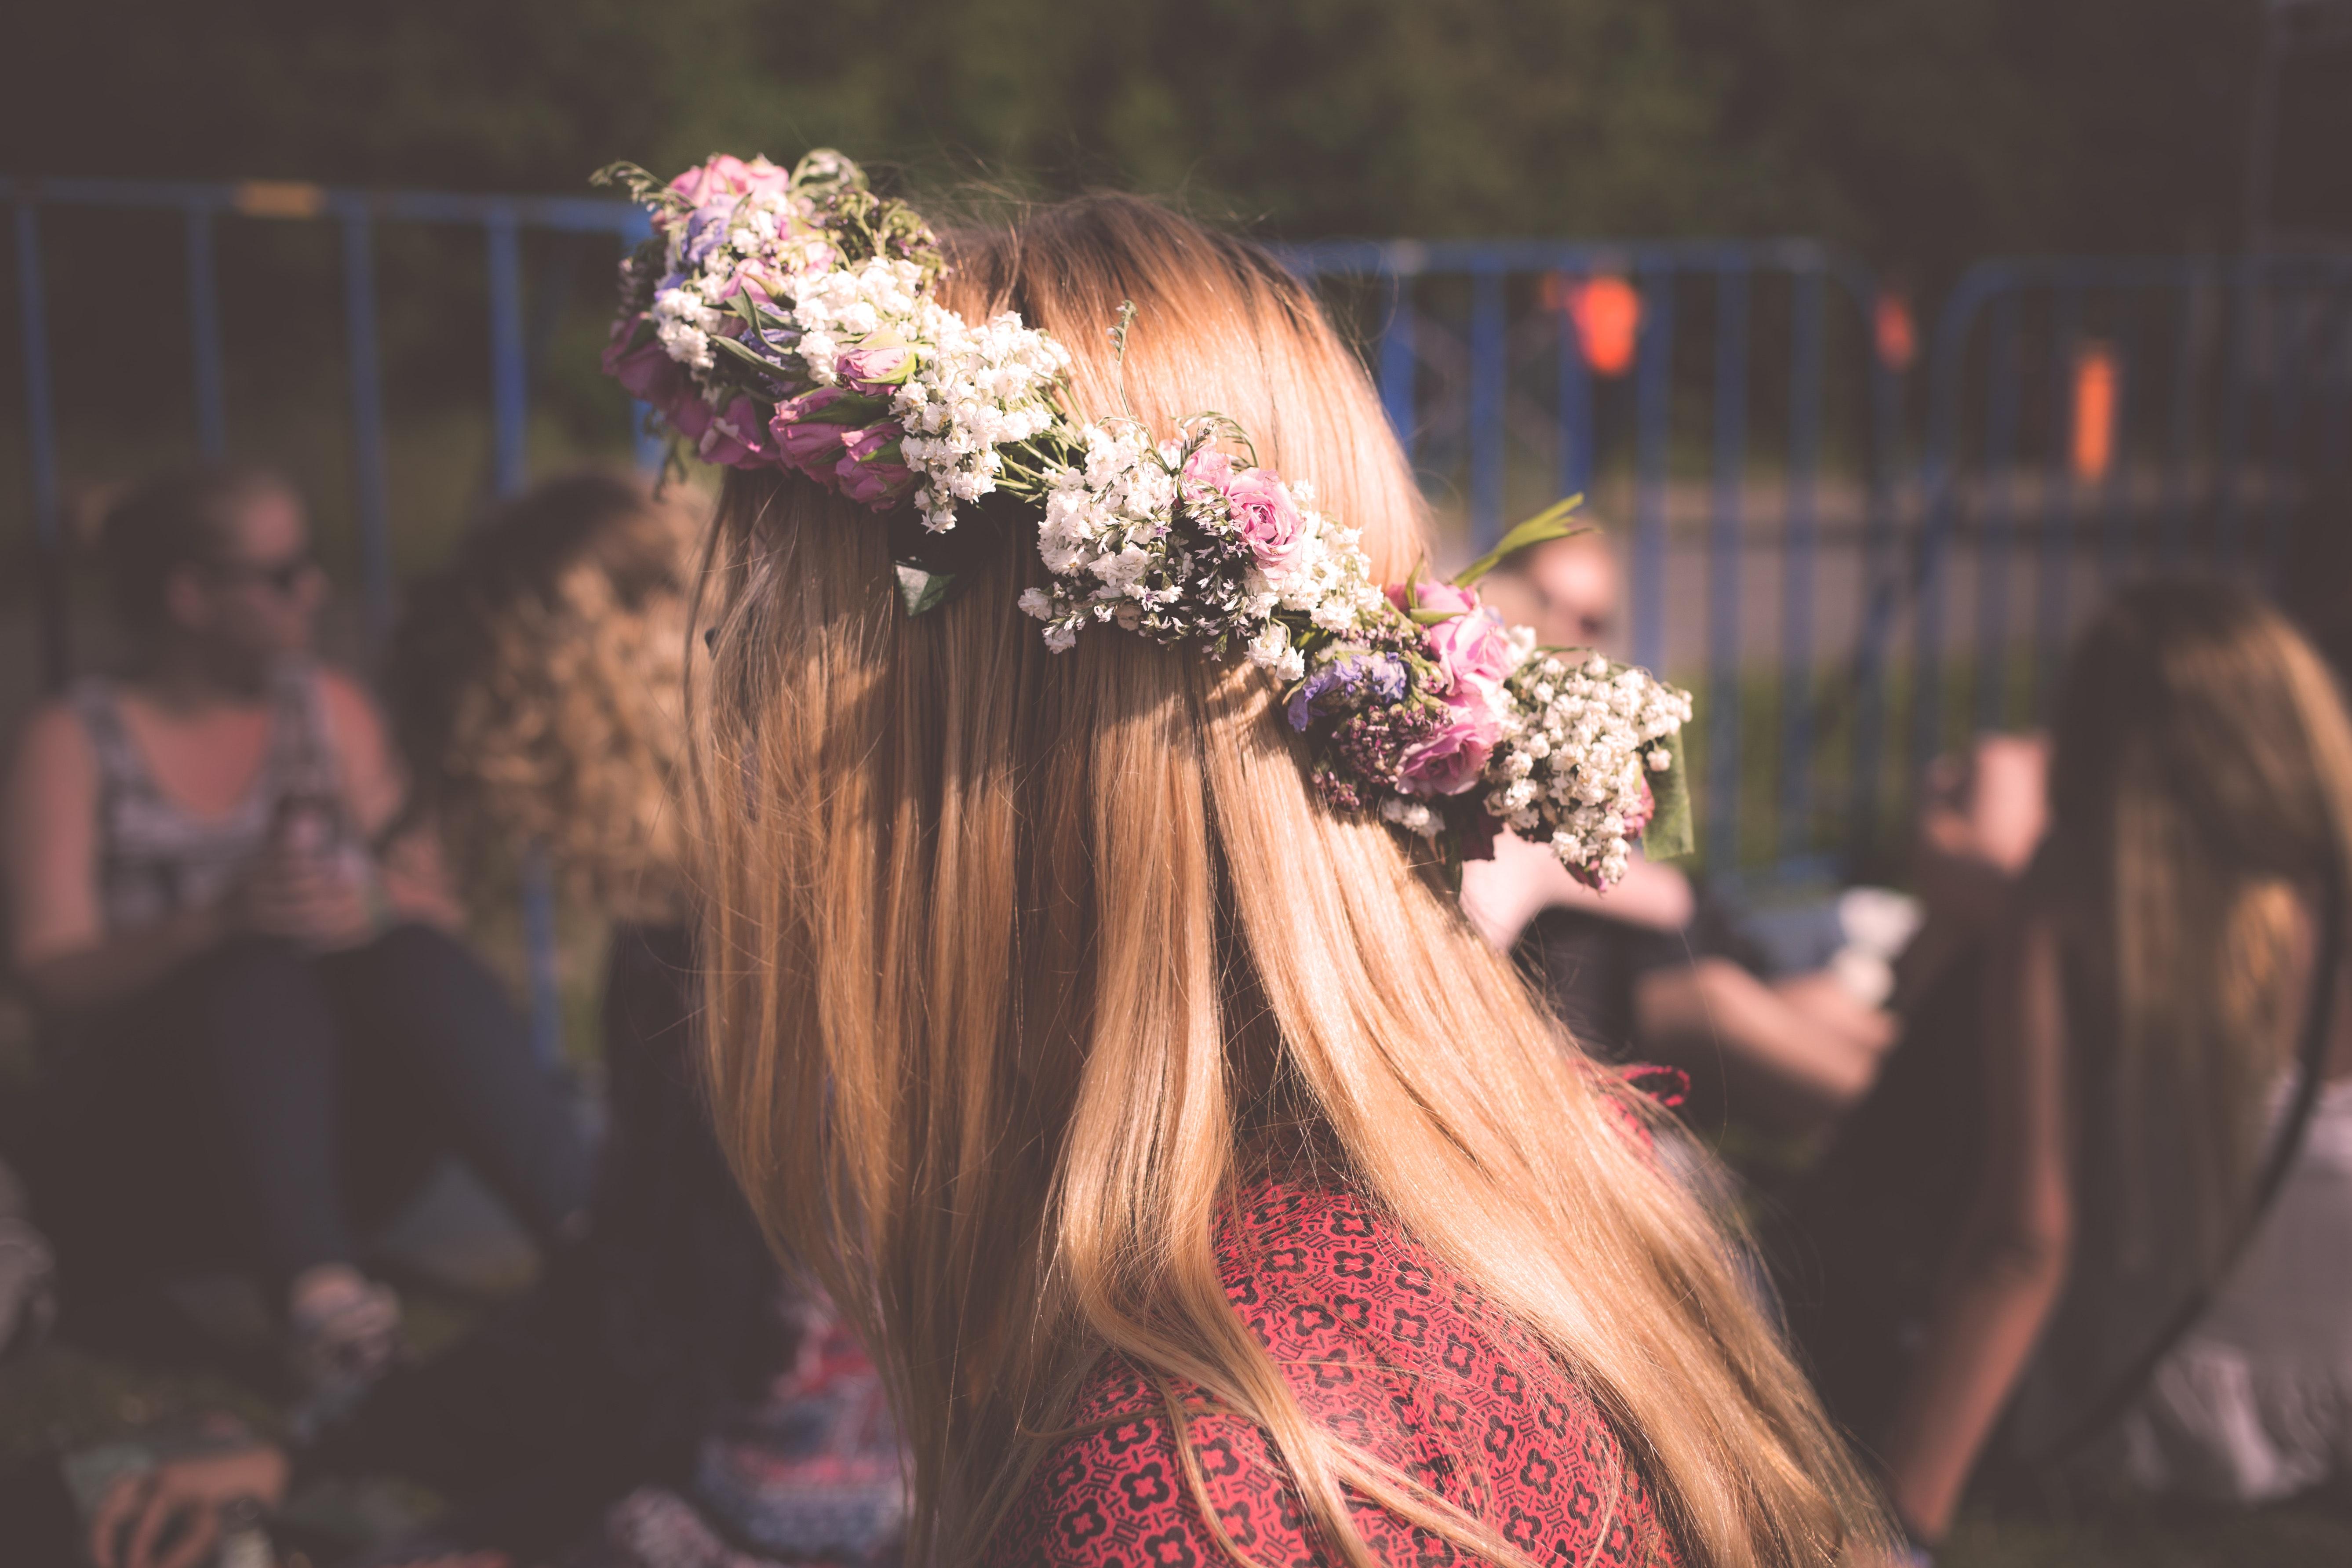 1000 Beautiful Flower Crown Photos Pexels Free Stock Photos